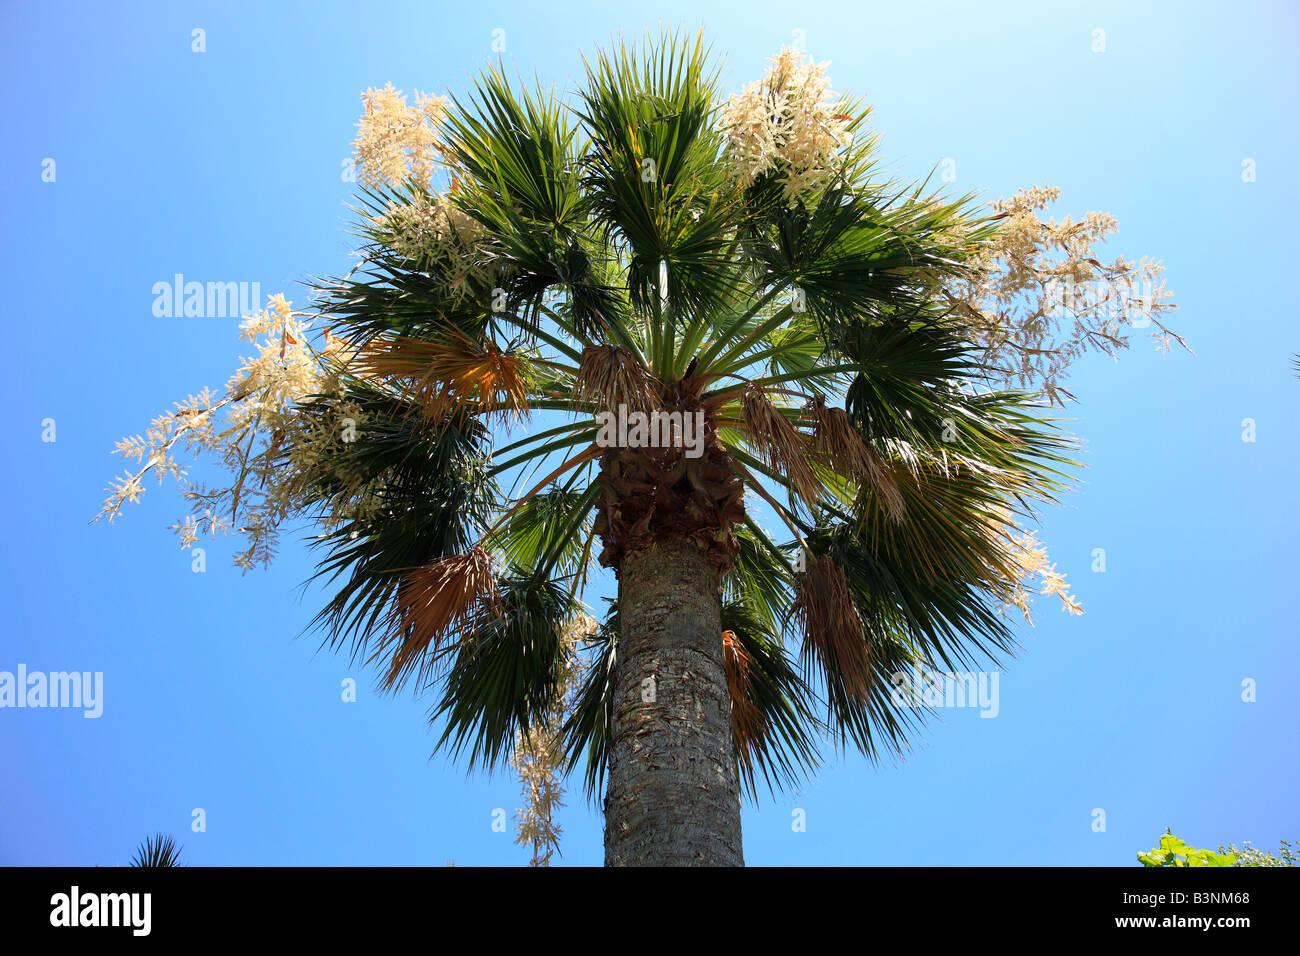 Natur, Pflanzen, Palme, Hanfpalme, Trachycarpus, Kalabrien, Italien, Europa - Stock Image